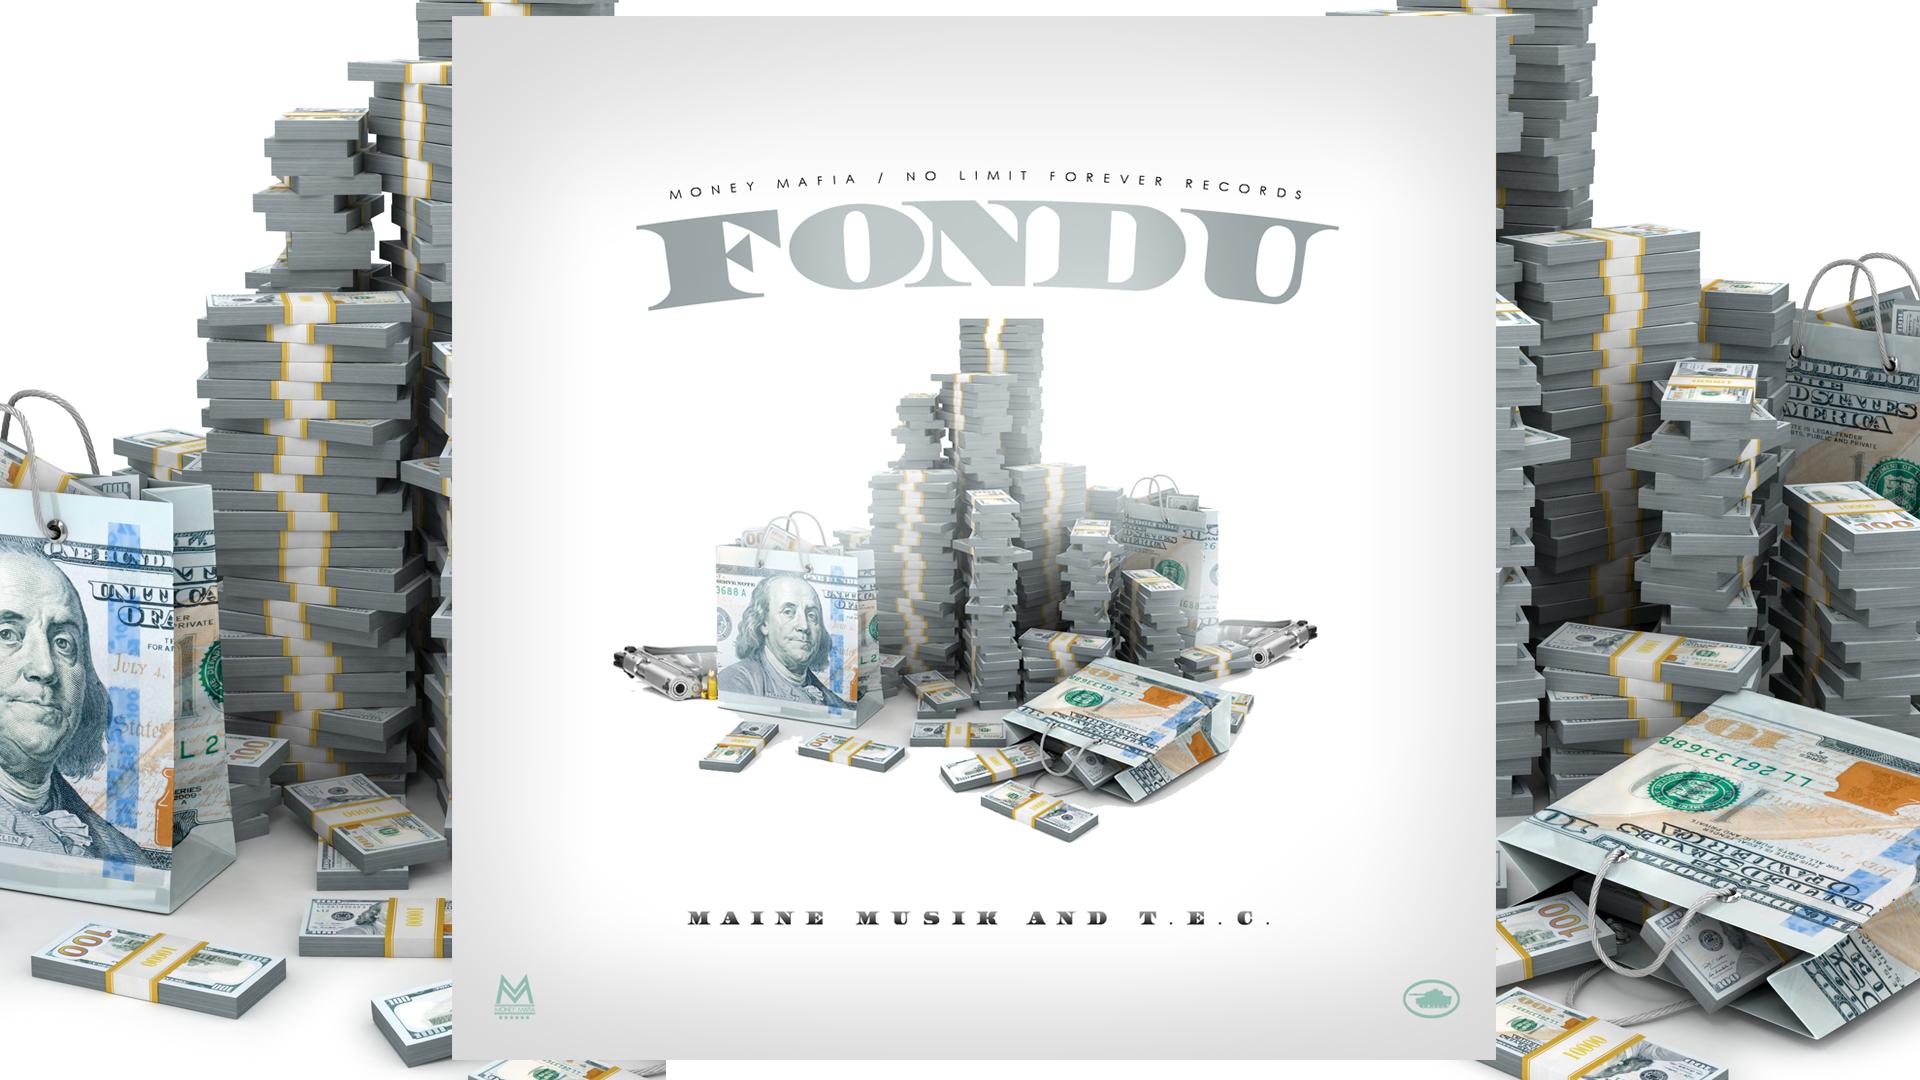 MasterP_MoneyMafia_FONDU_1_videobanner1